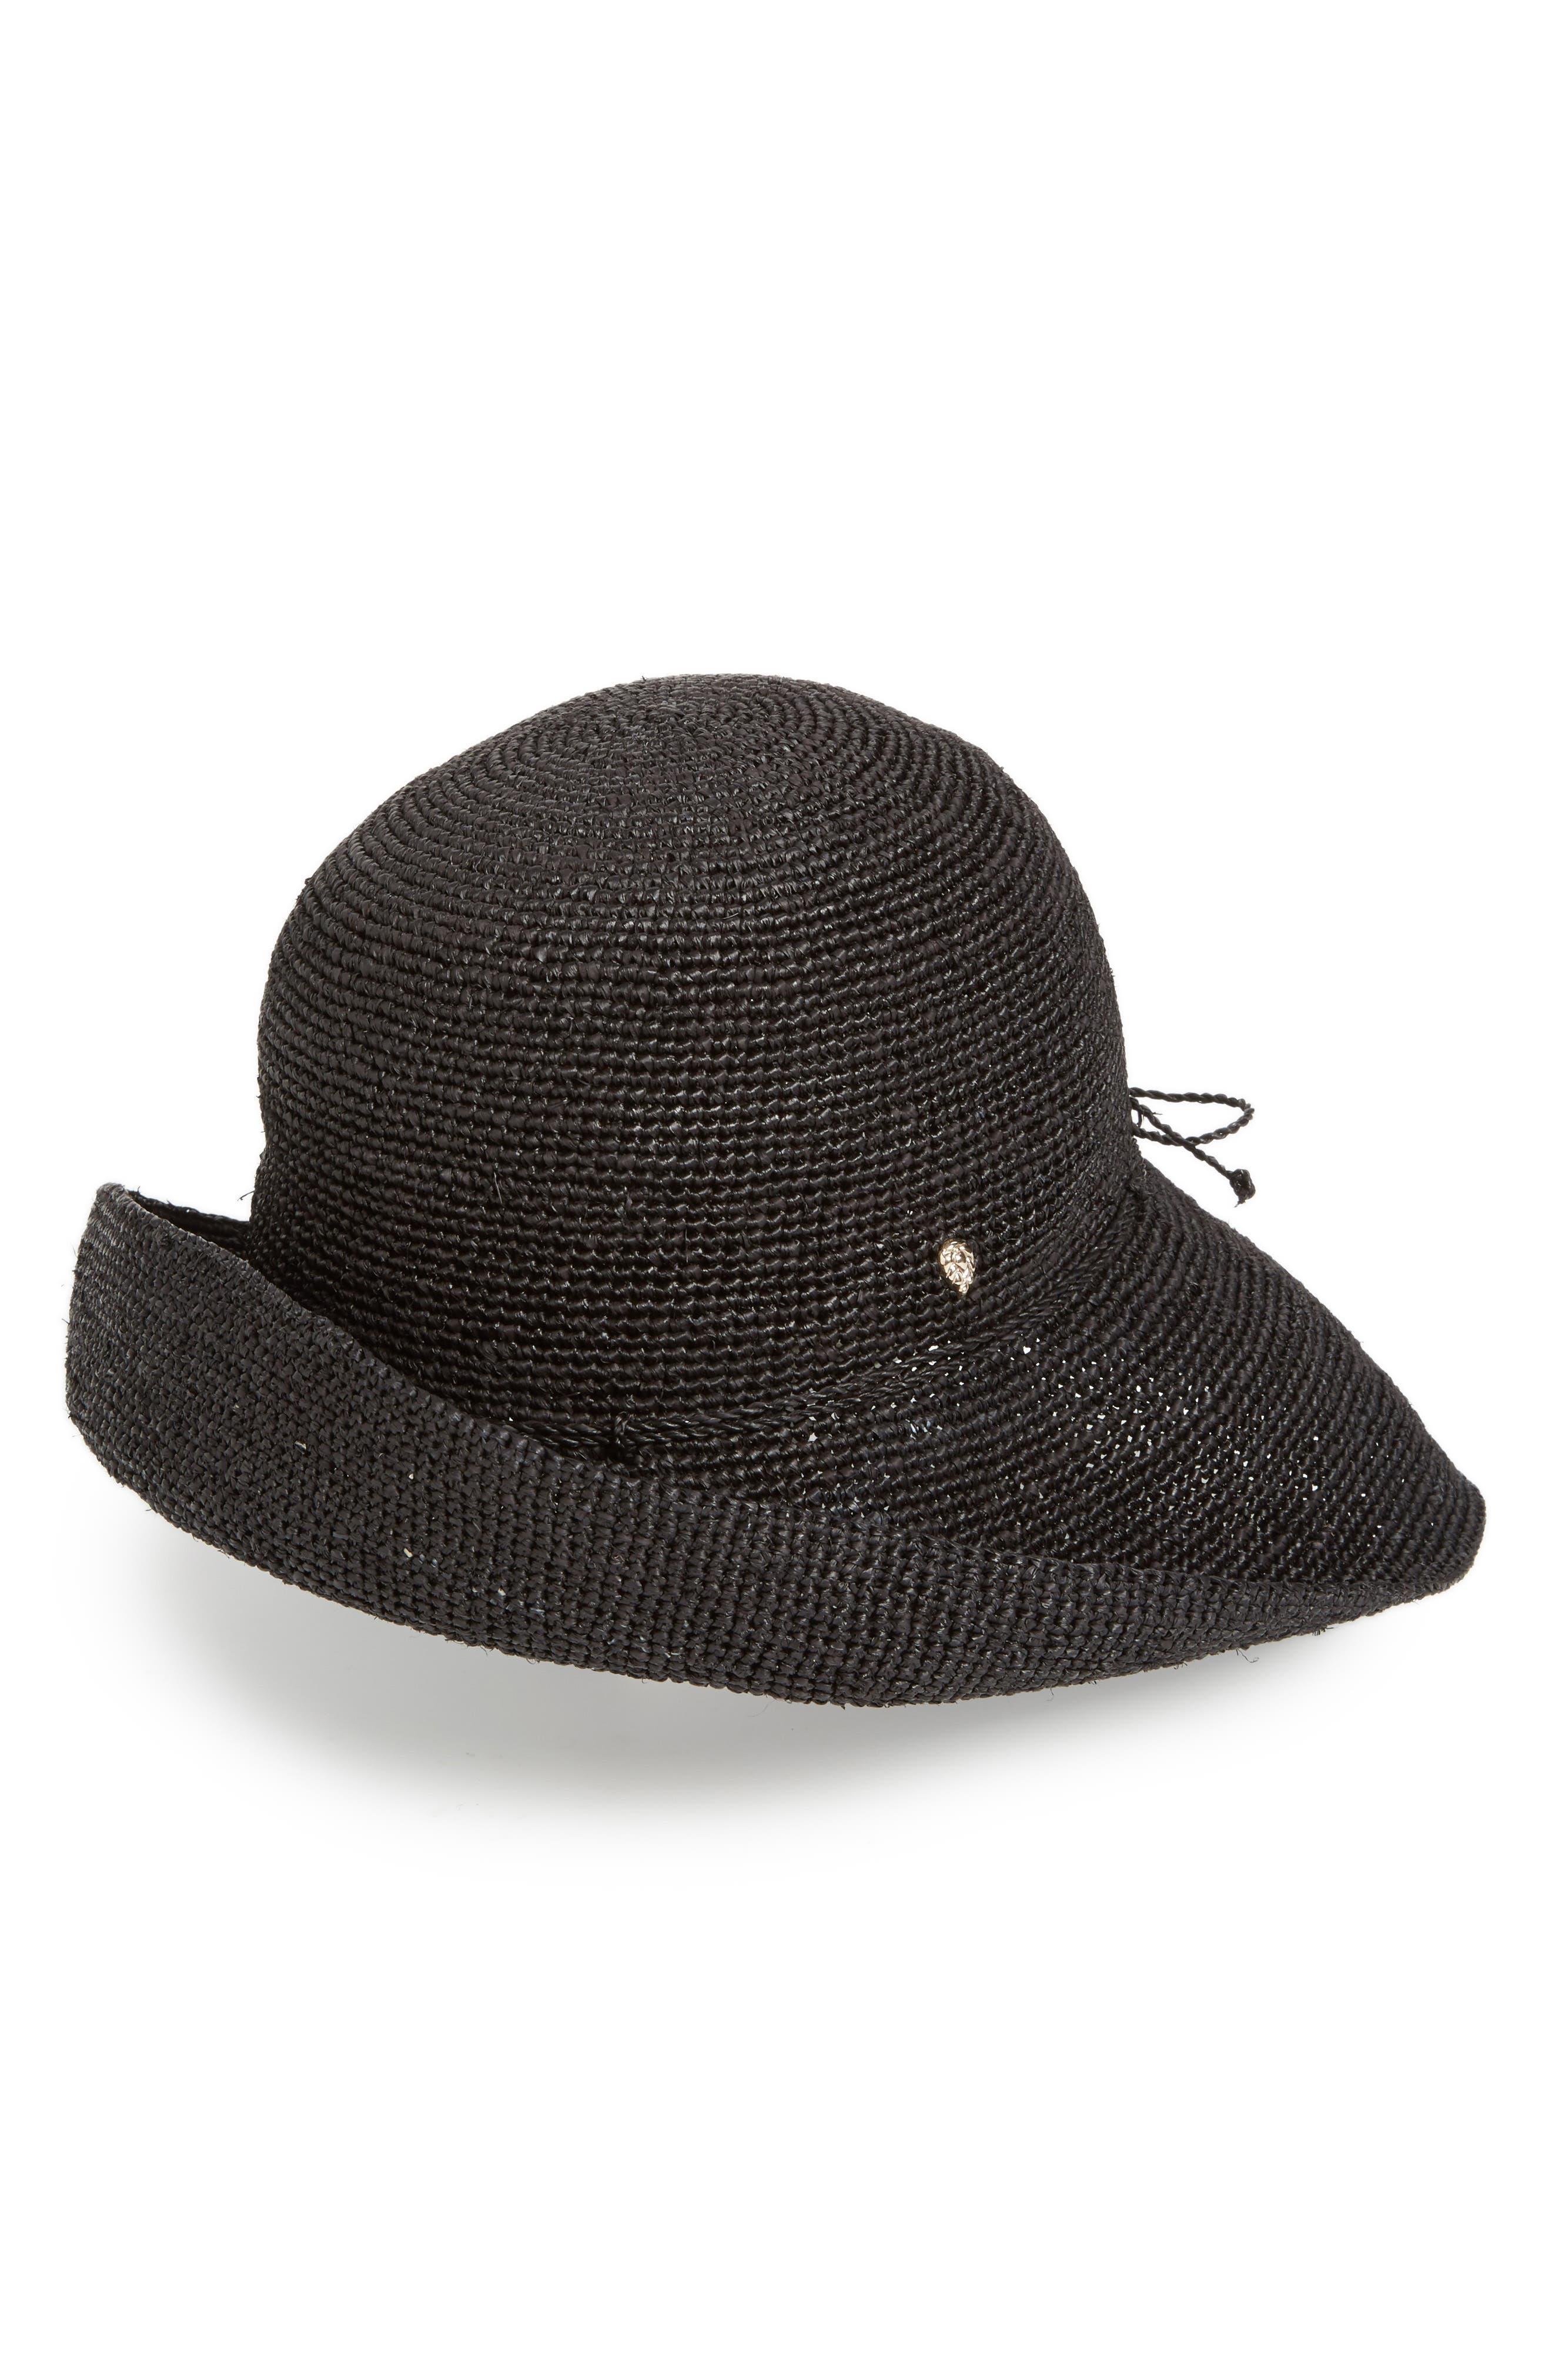 HELEN KAMINSKI Provence 10 Packable Raffia Hat